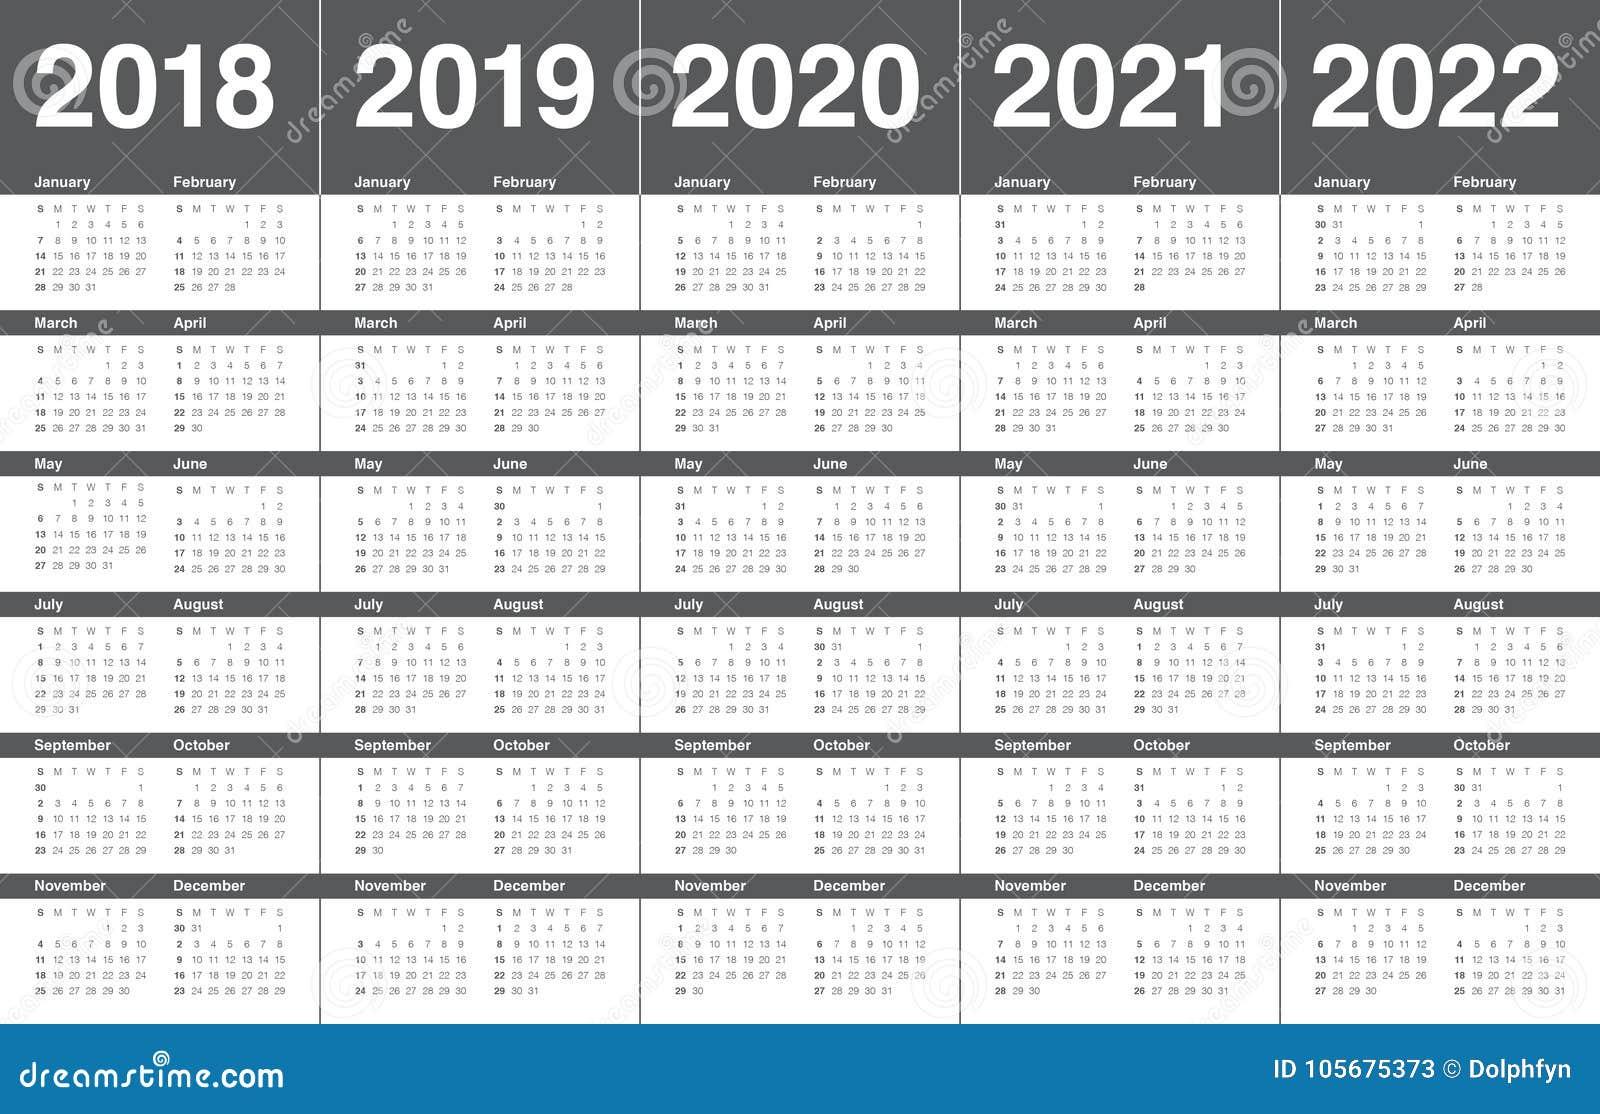 Year 2018 2019 2020 2021 2022 calendar vector